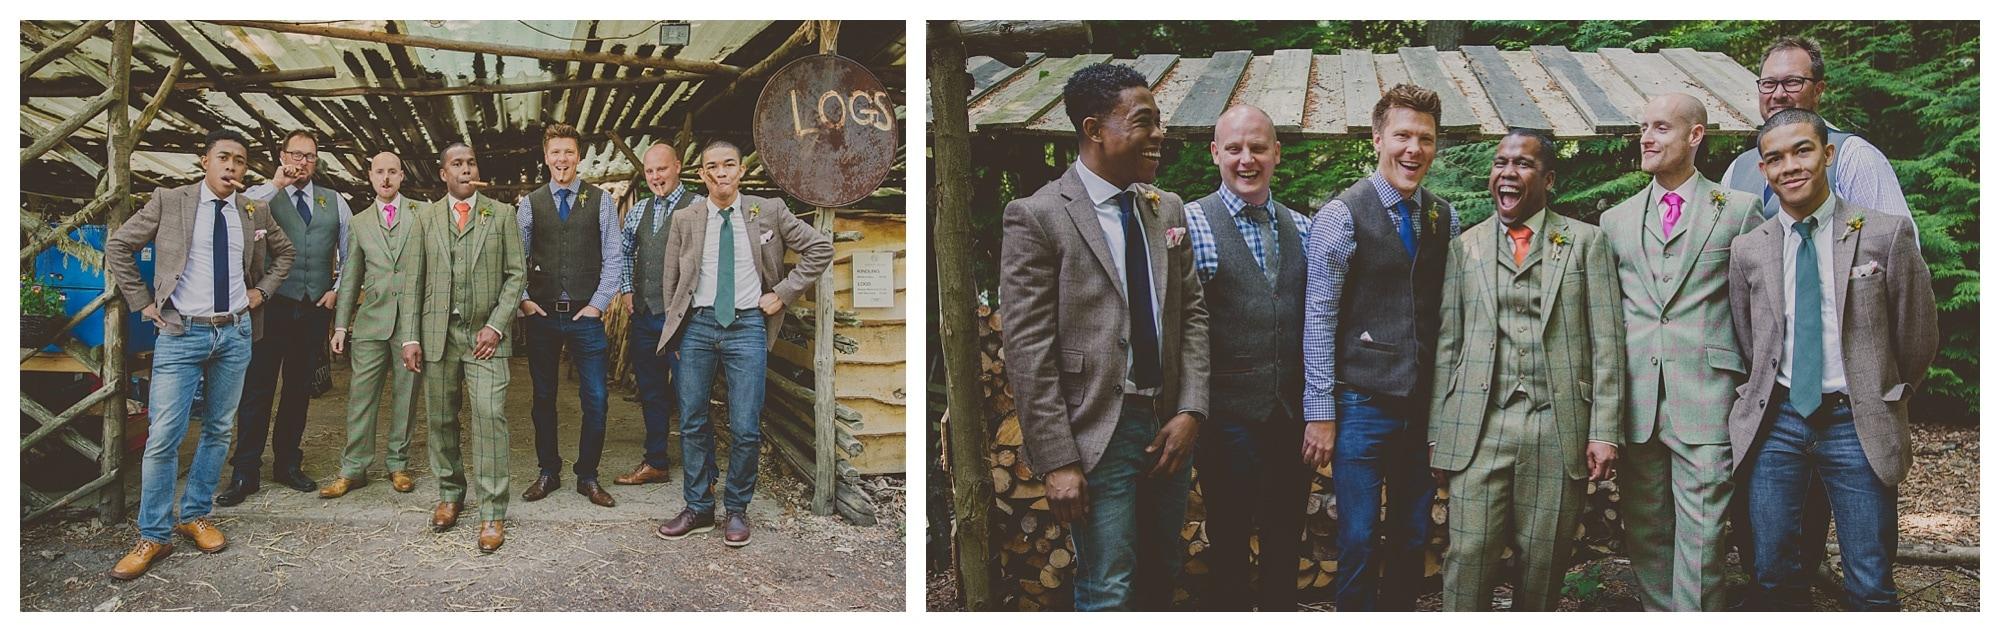 staffordshire wedding photographer woodland forest wedding boho wedding outdoor wedding